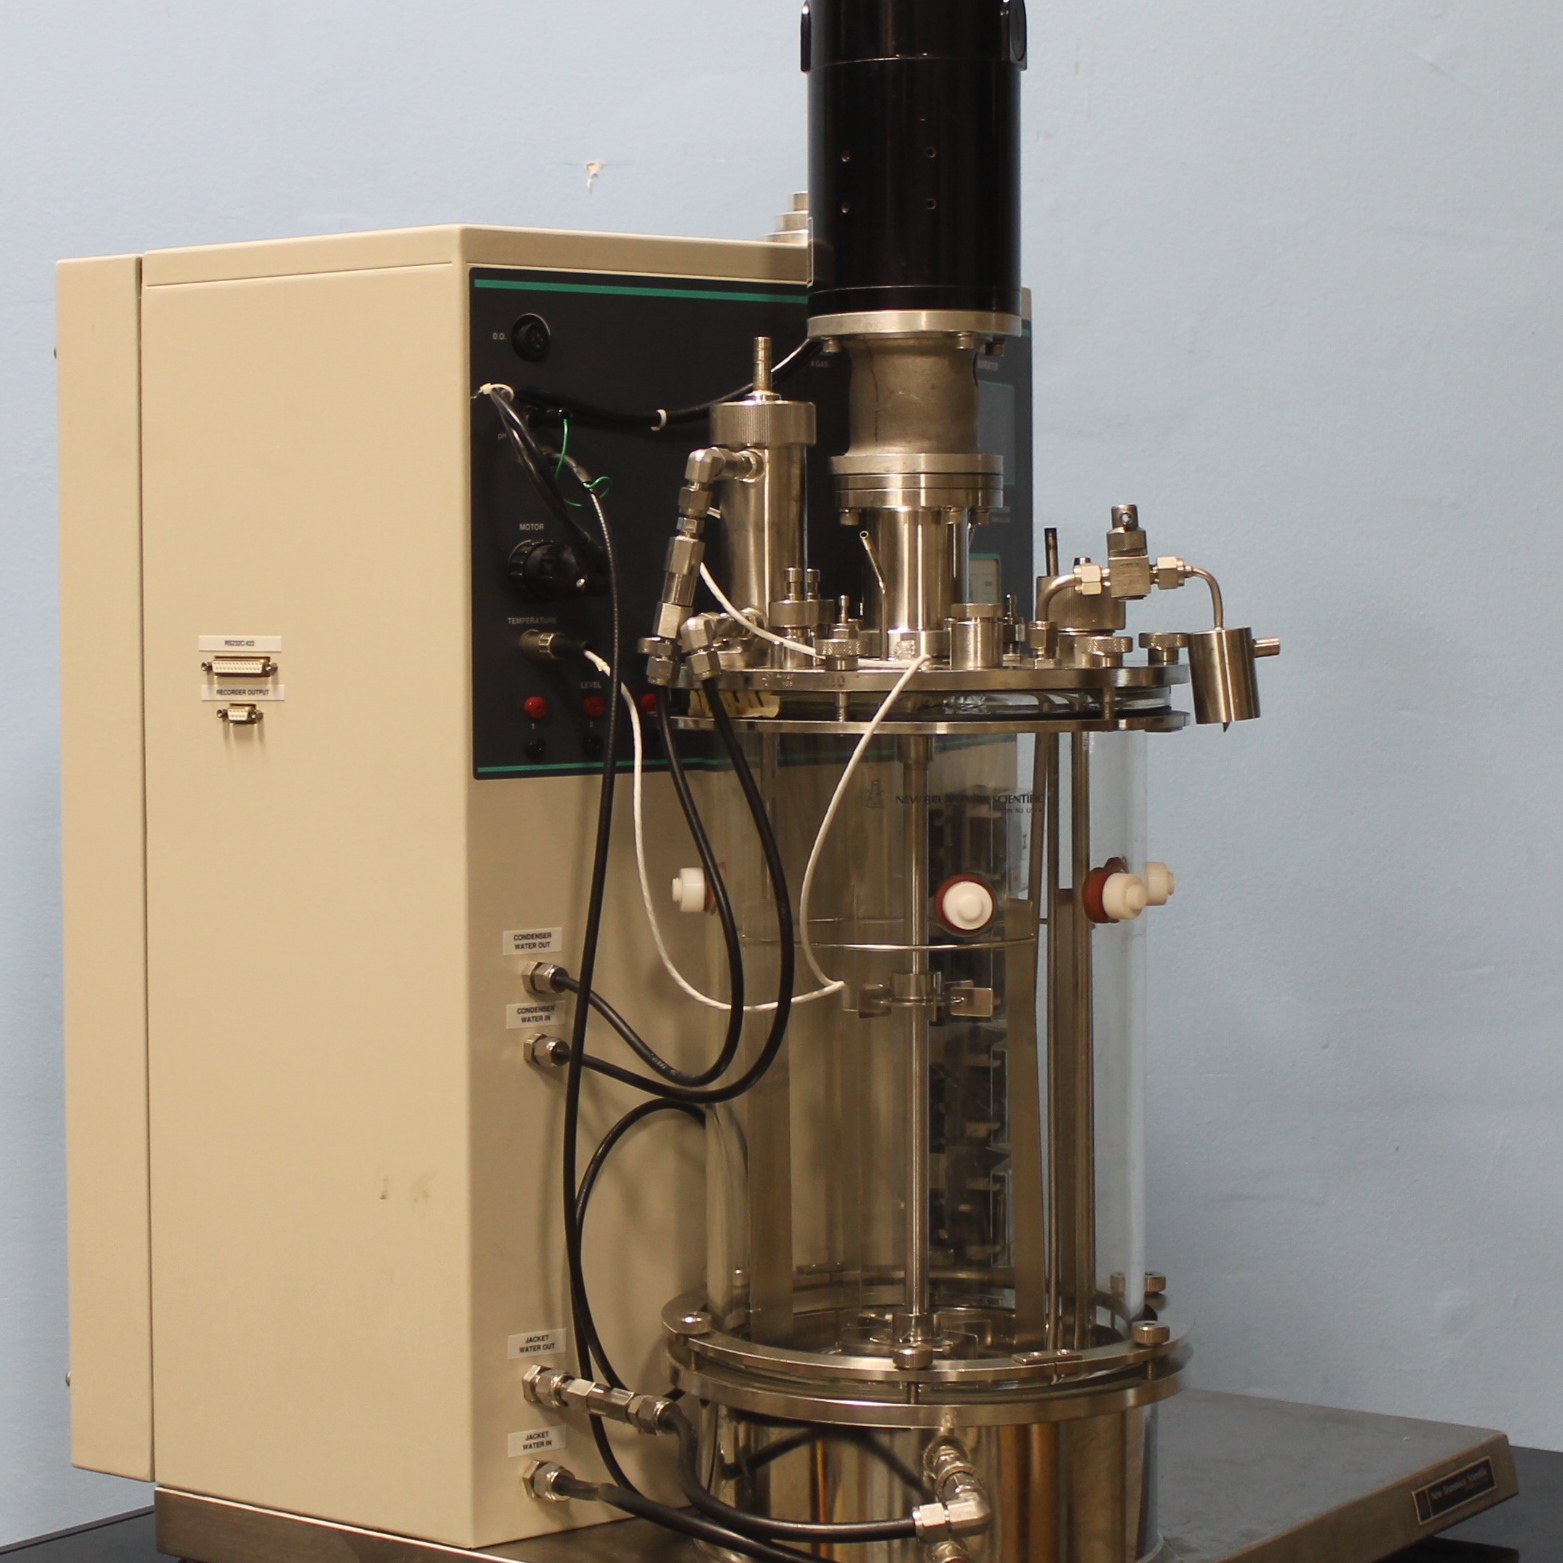 New Brunswick Scientific Co BioFlo 3000 Fermentor Image